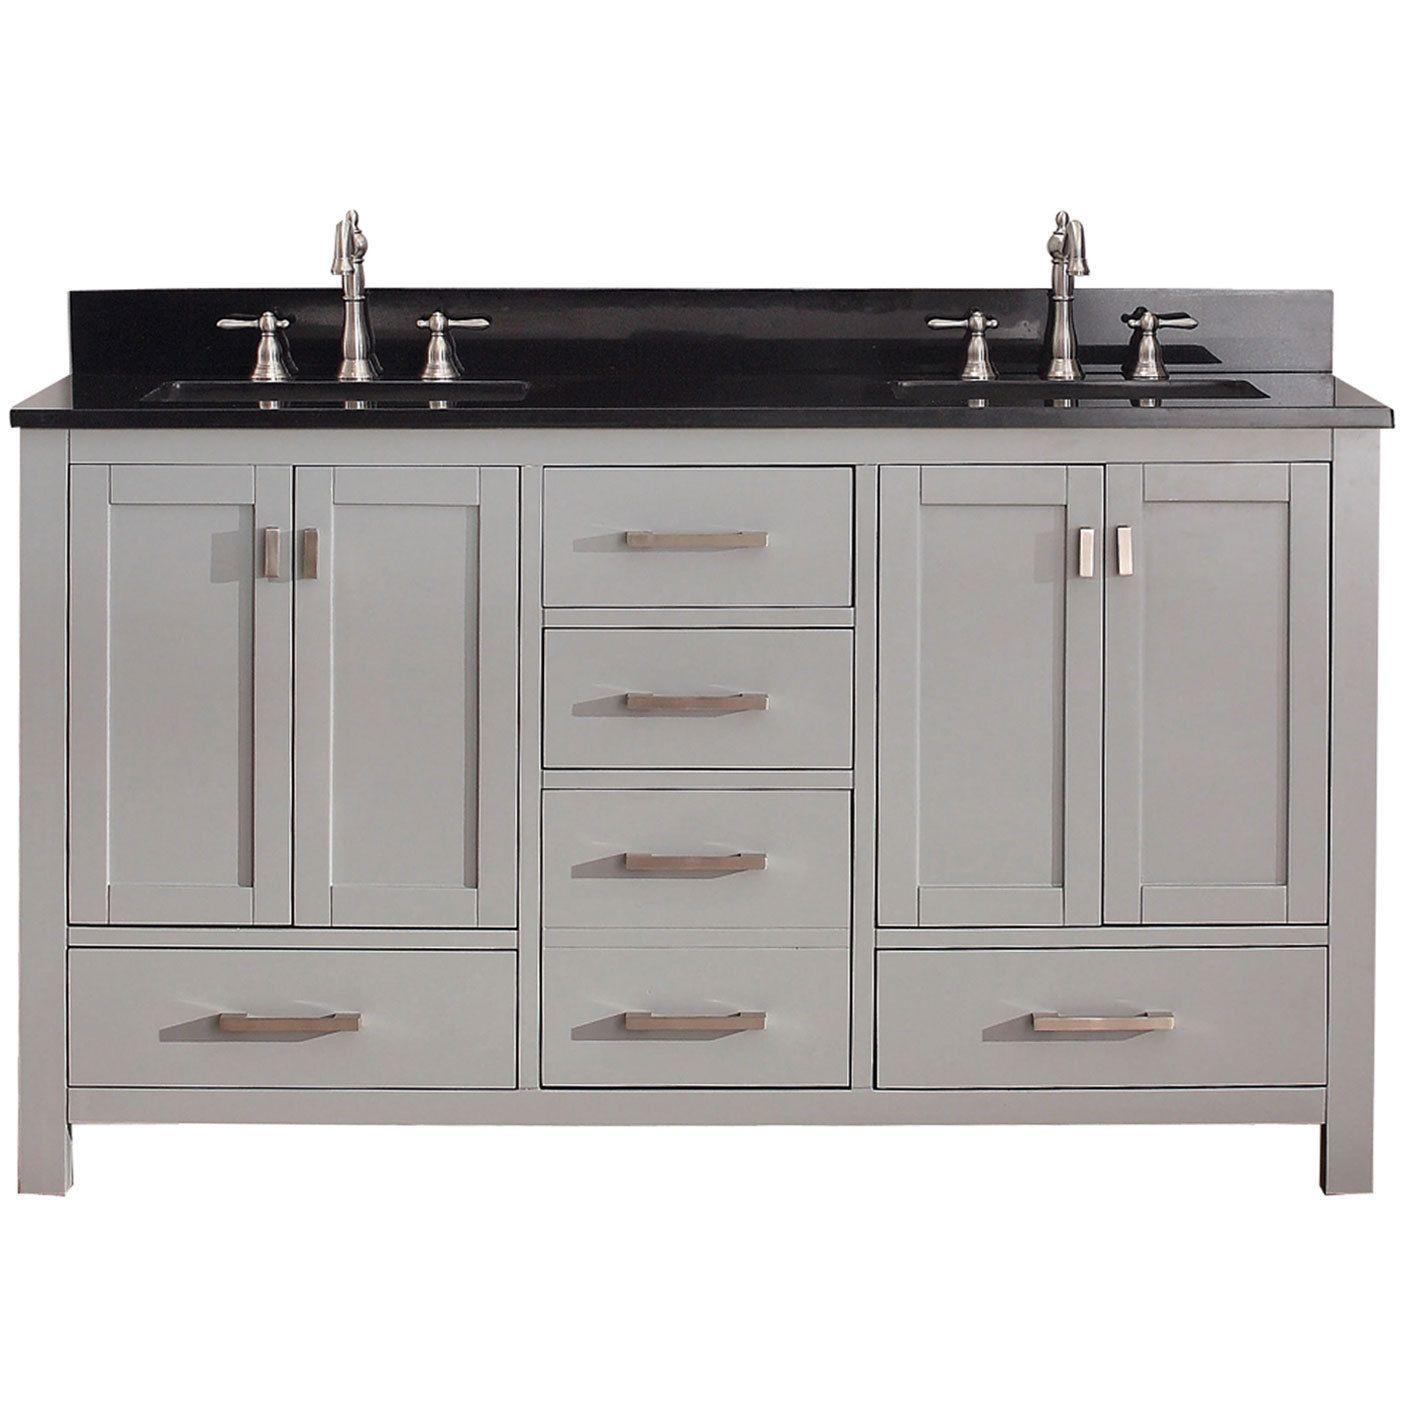 Double sink white bathroom vanities avanity modero inch chilled grey double vanity combo whitegrey